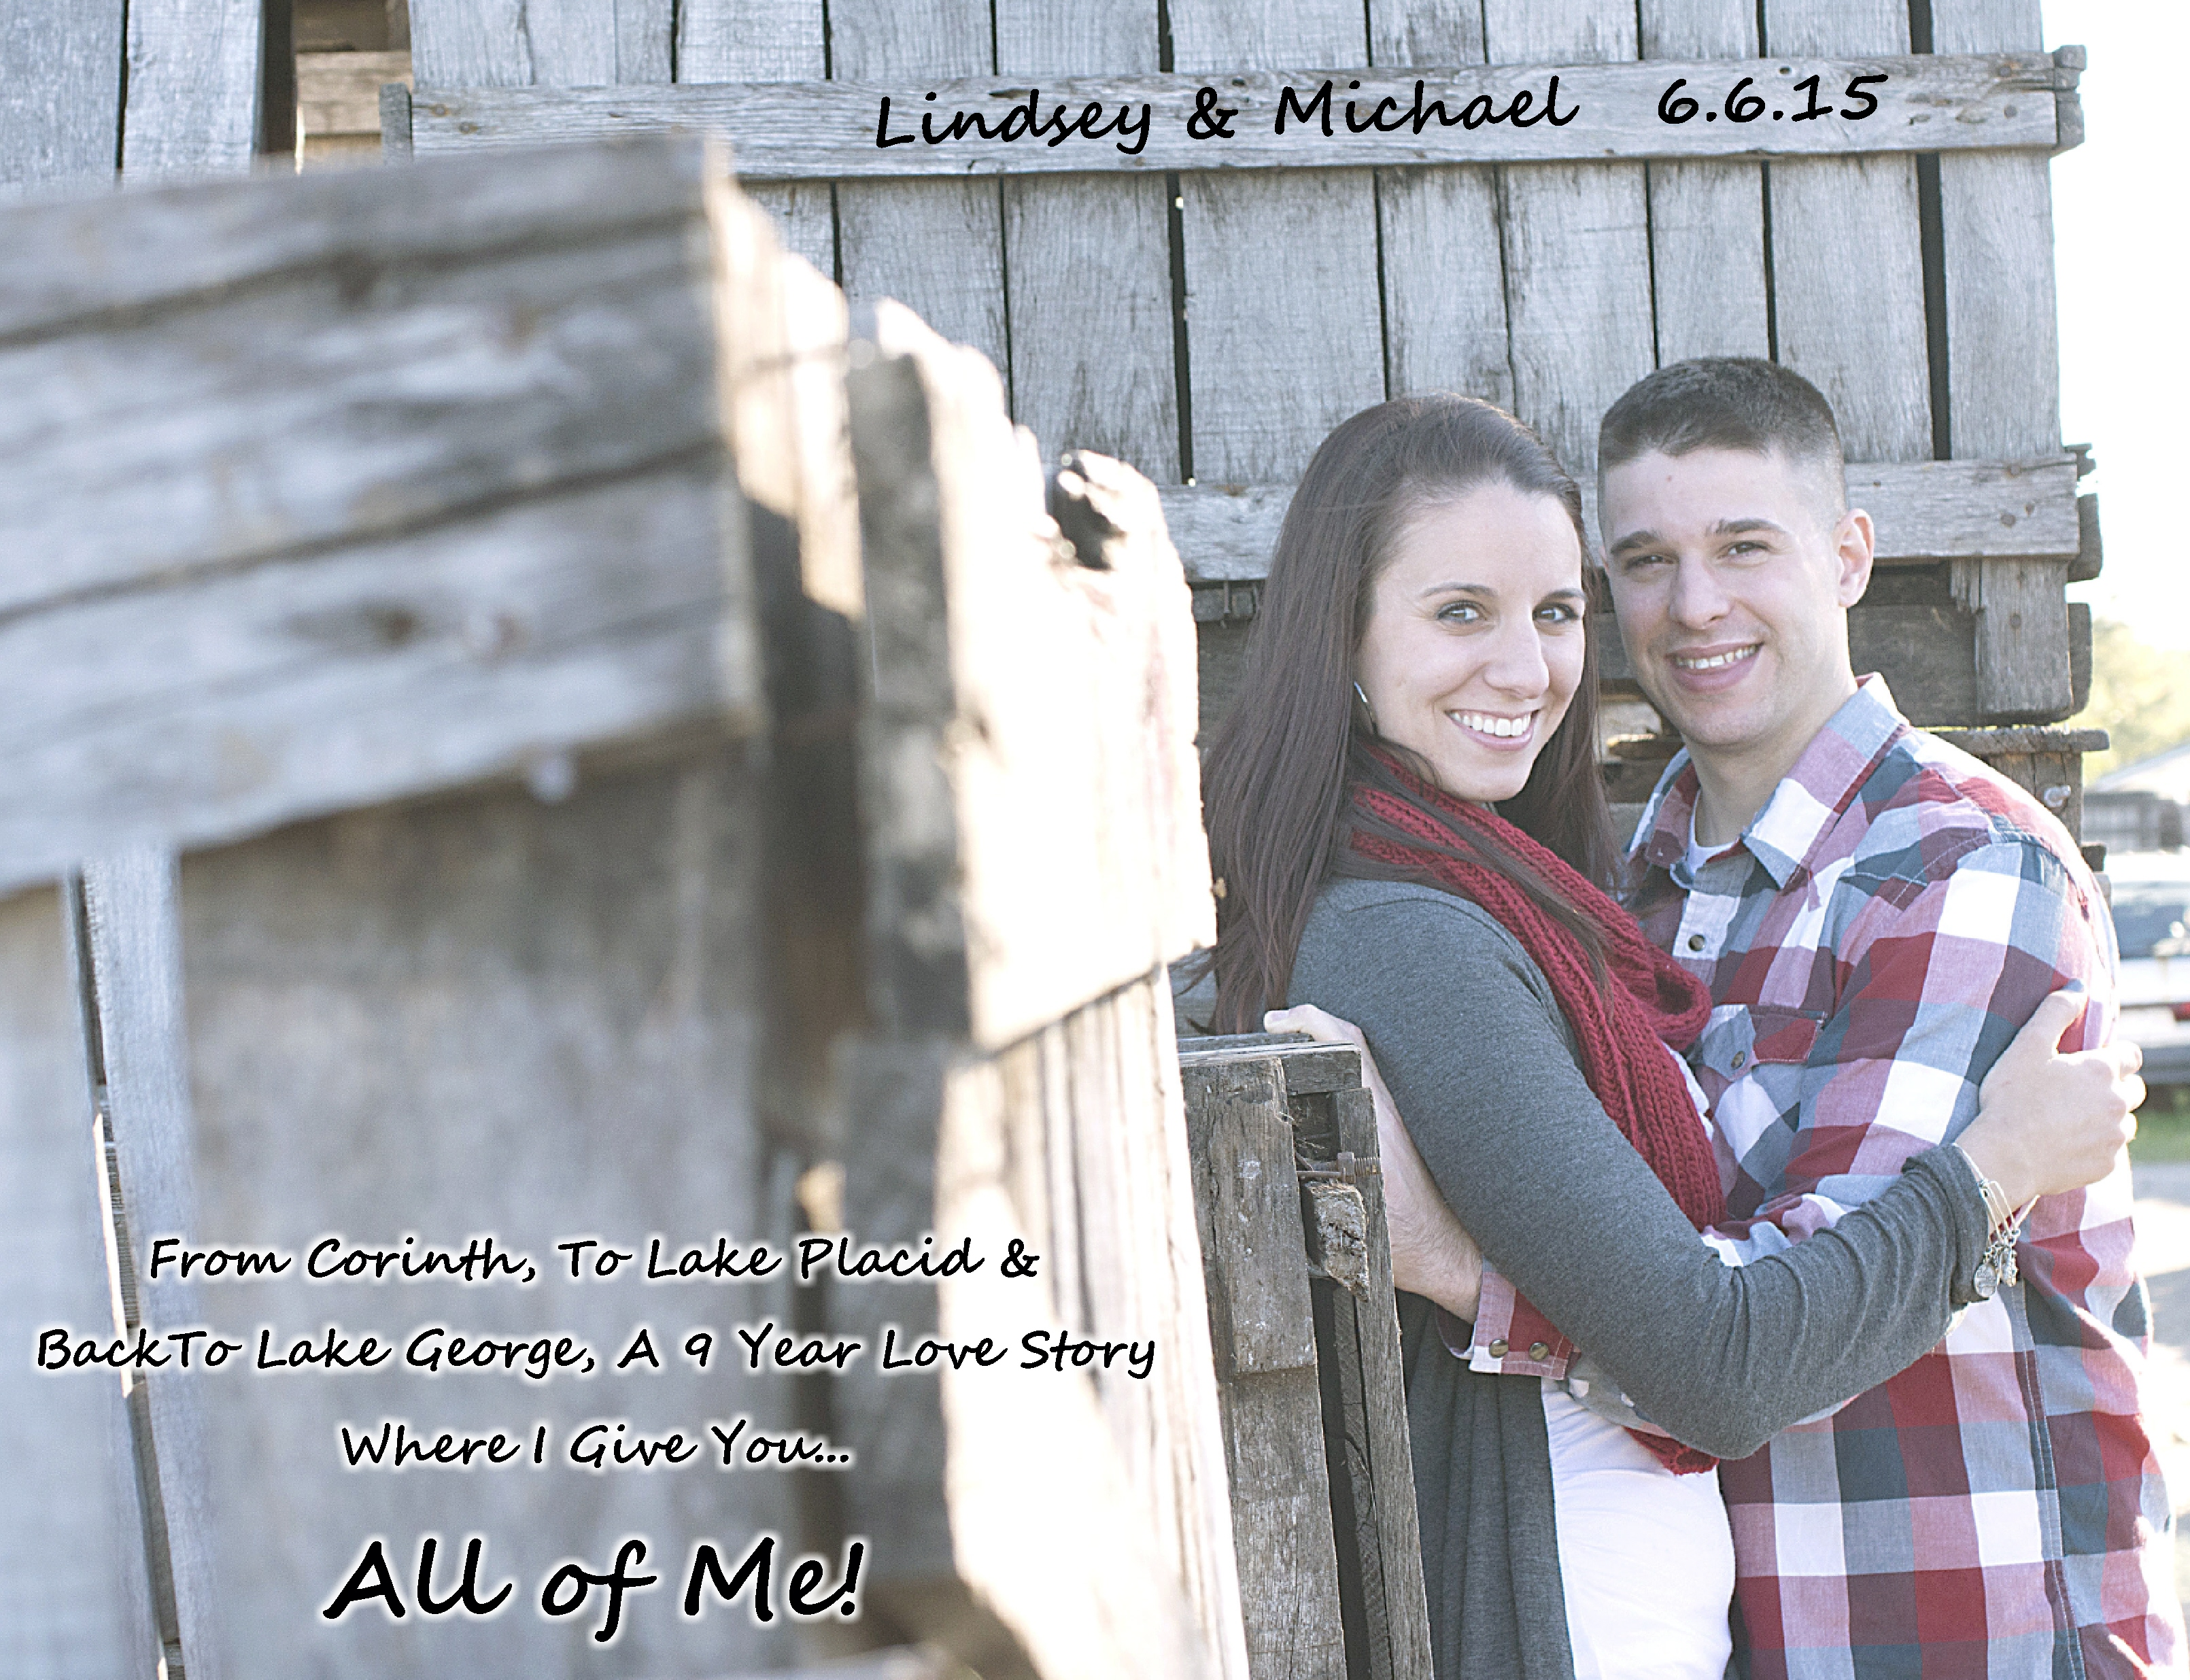 6-6-15 lindsey & michael